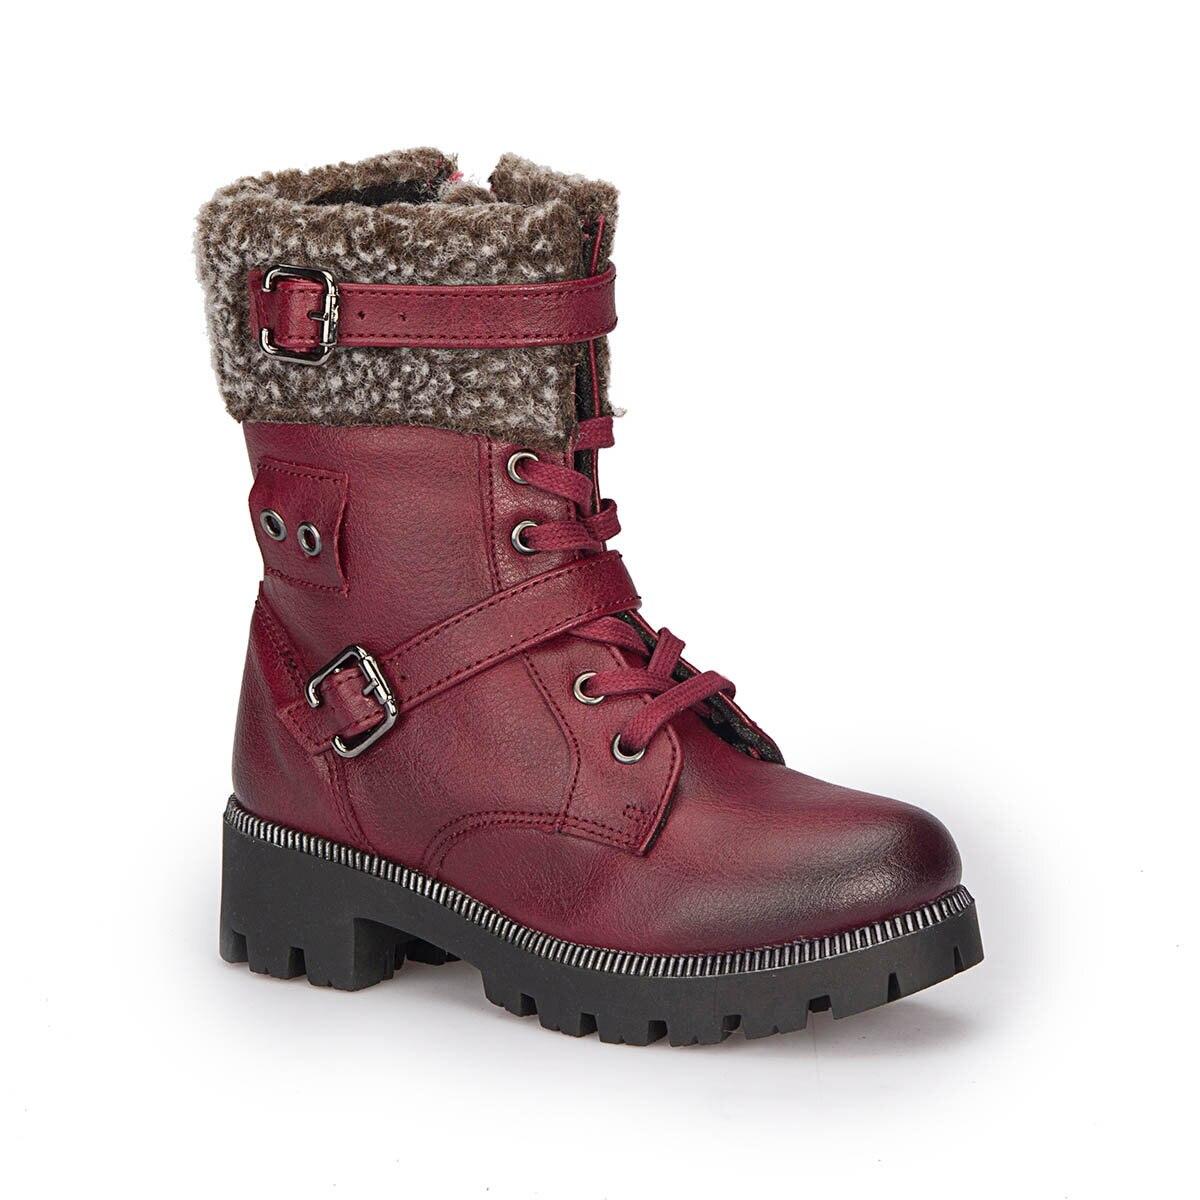 FLO 72.508486.P Burgundy Female Child Boots Polaris